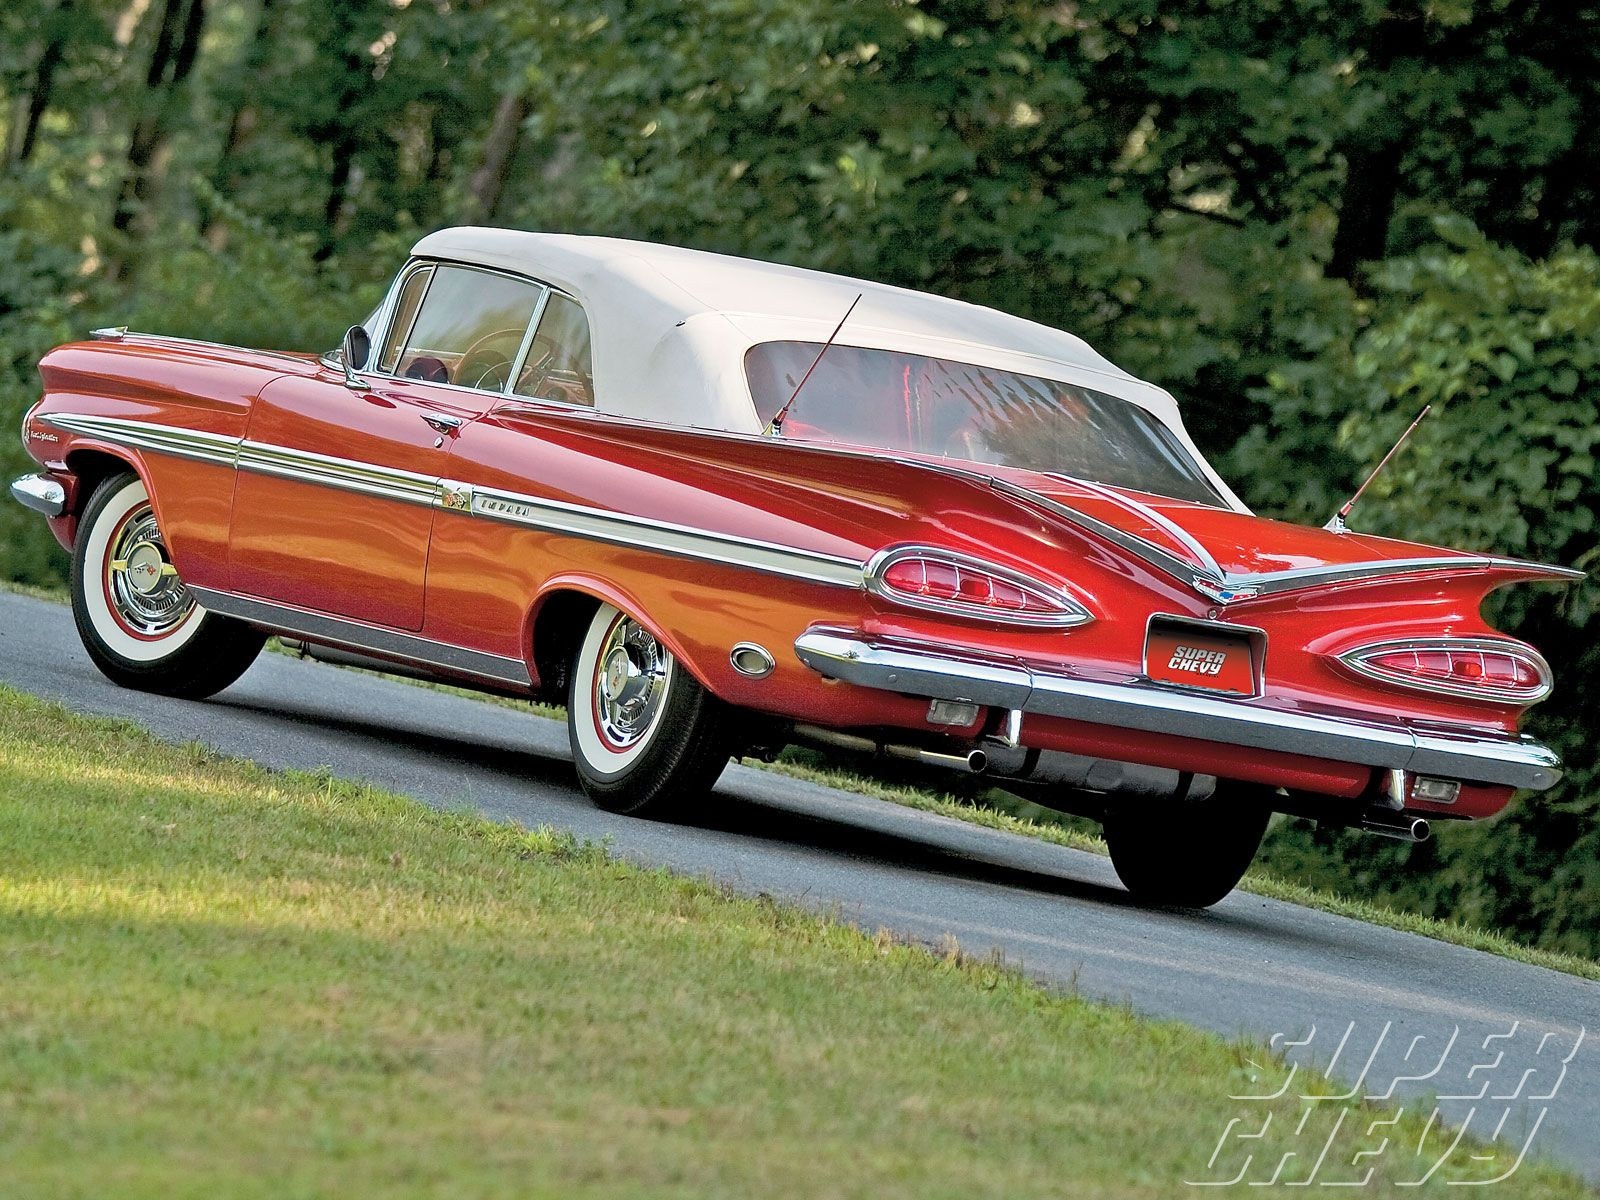 hight resolution of 1959 chevrolet impala scott chalk 1959 chevrolet impala convertible driver side rear view